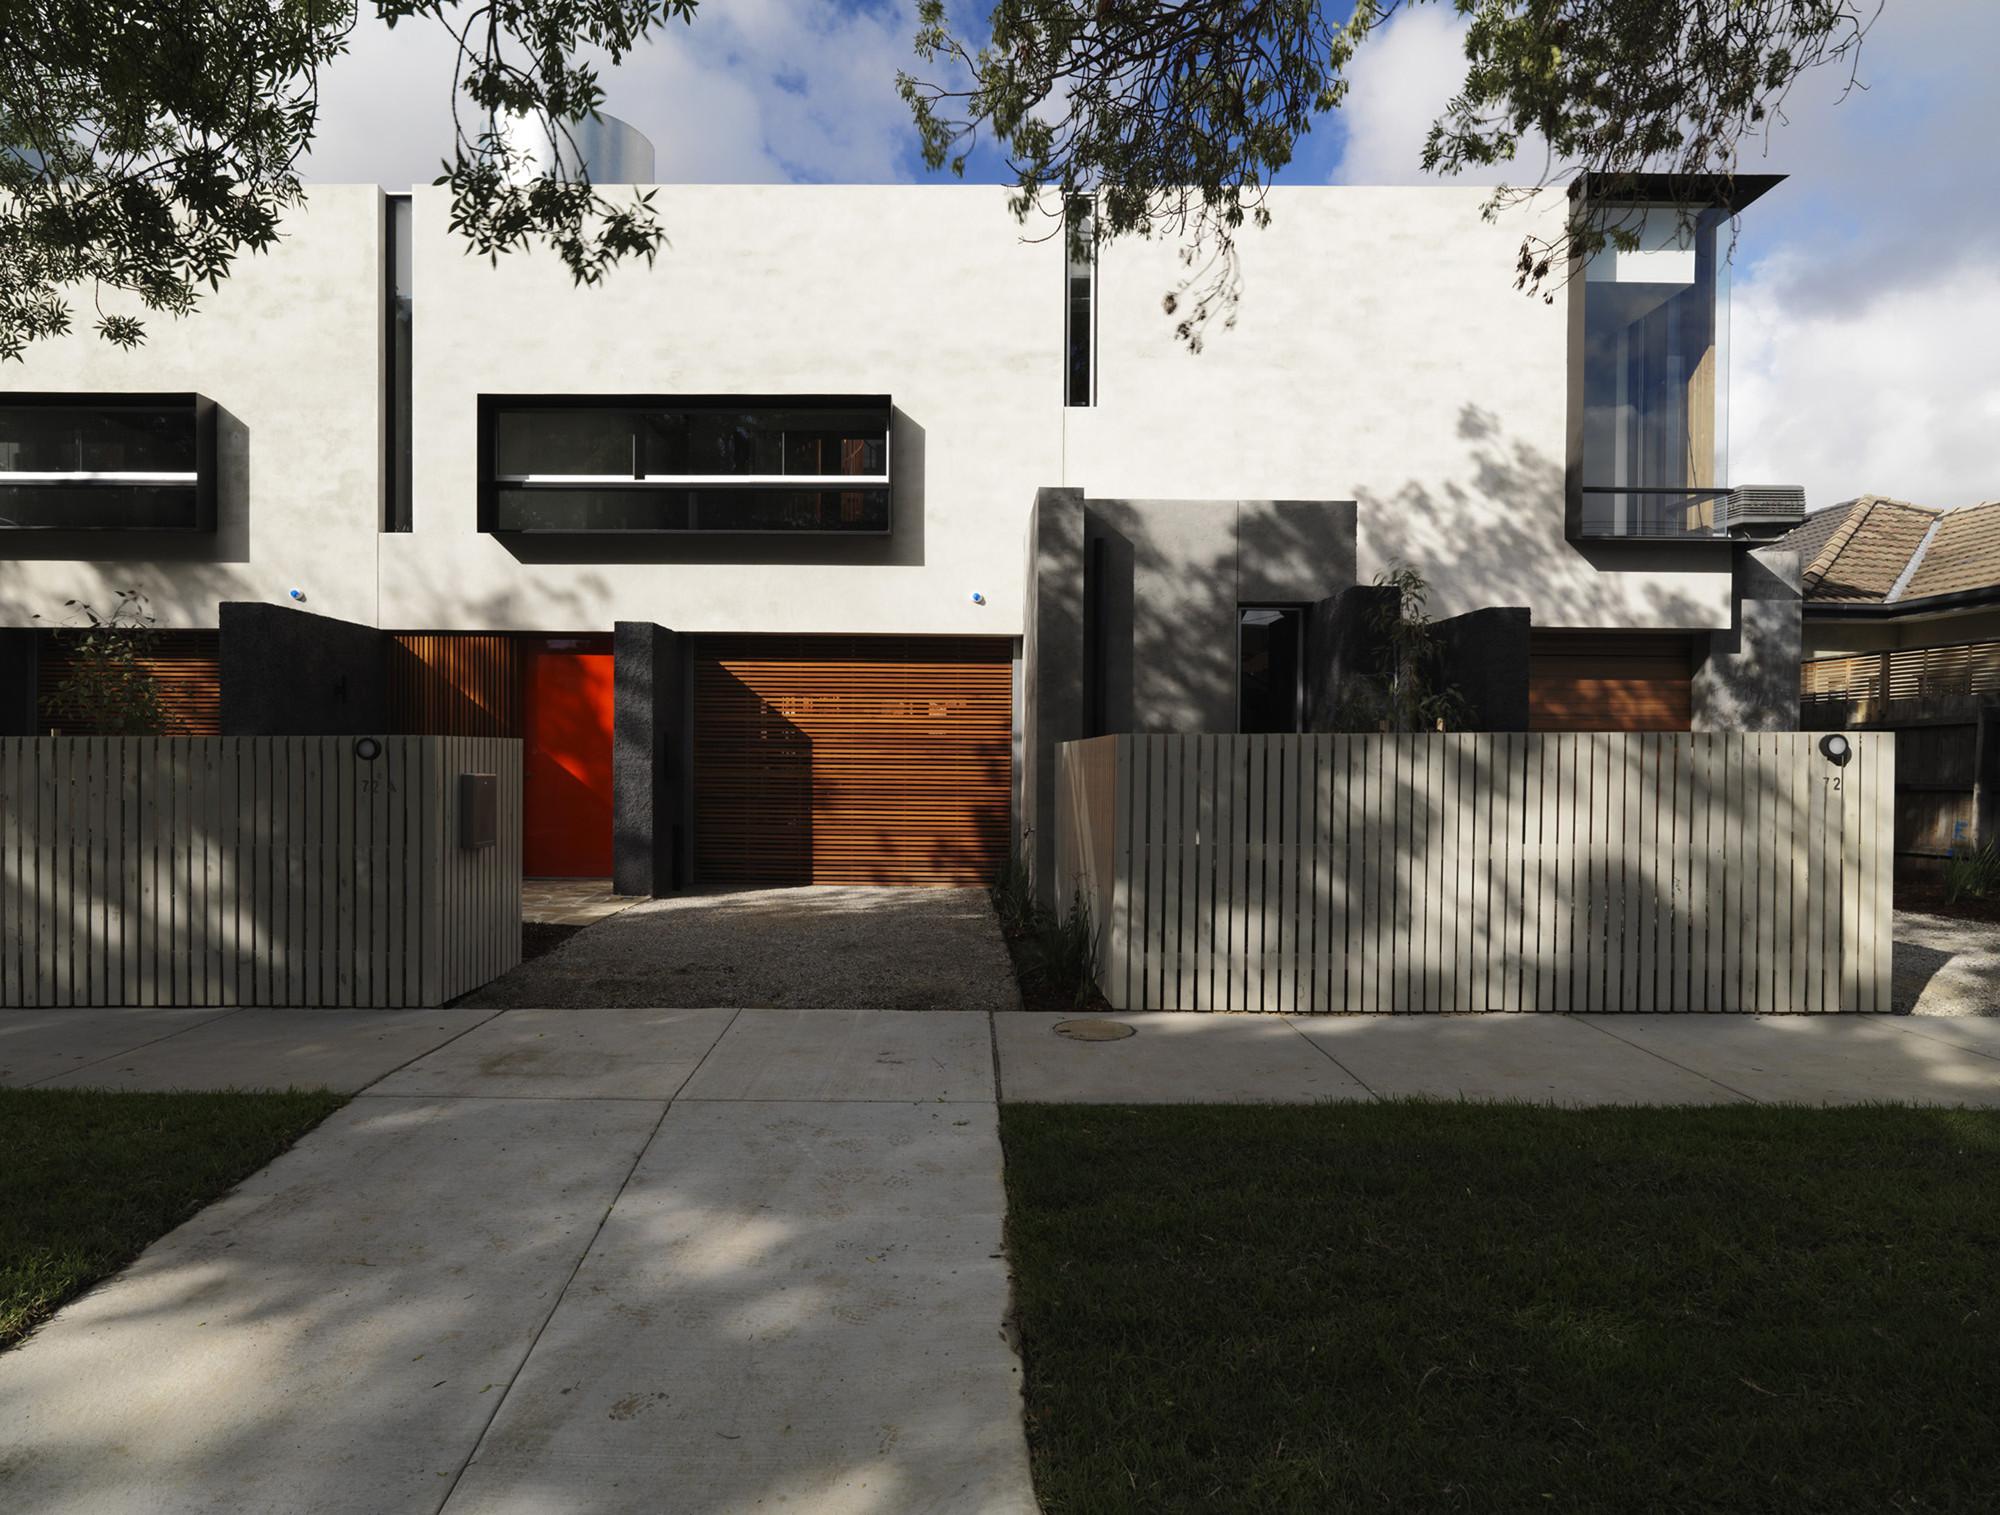 Elwood Townhouses / McAllister Alcock Architects, © Trevor Mein